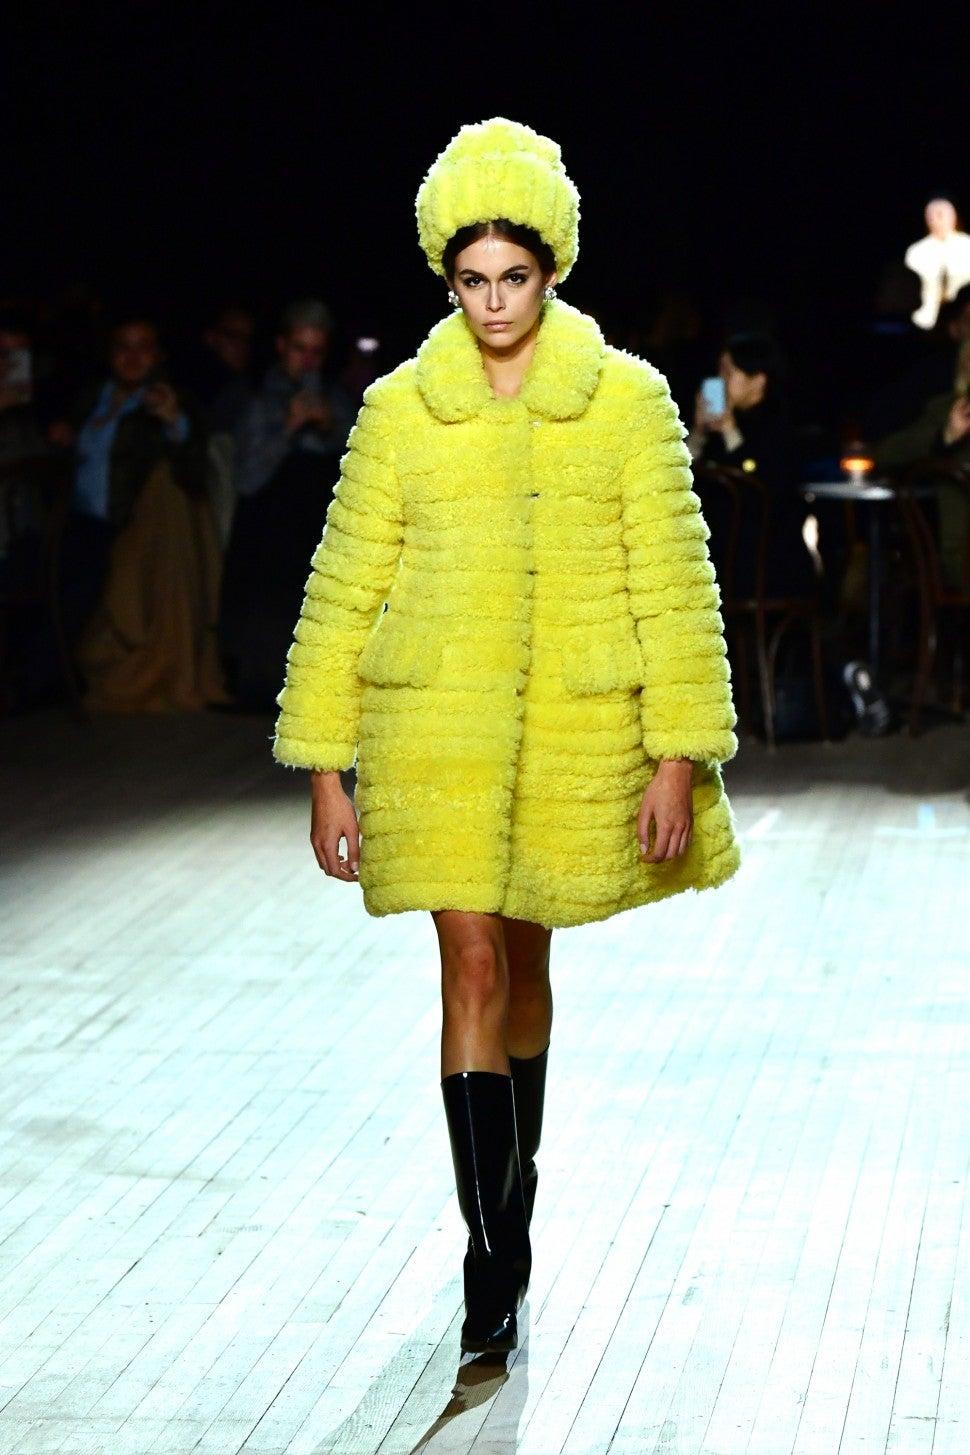 Kaia Gerber walking in Marc Jacobs F/W 2020 fashion show